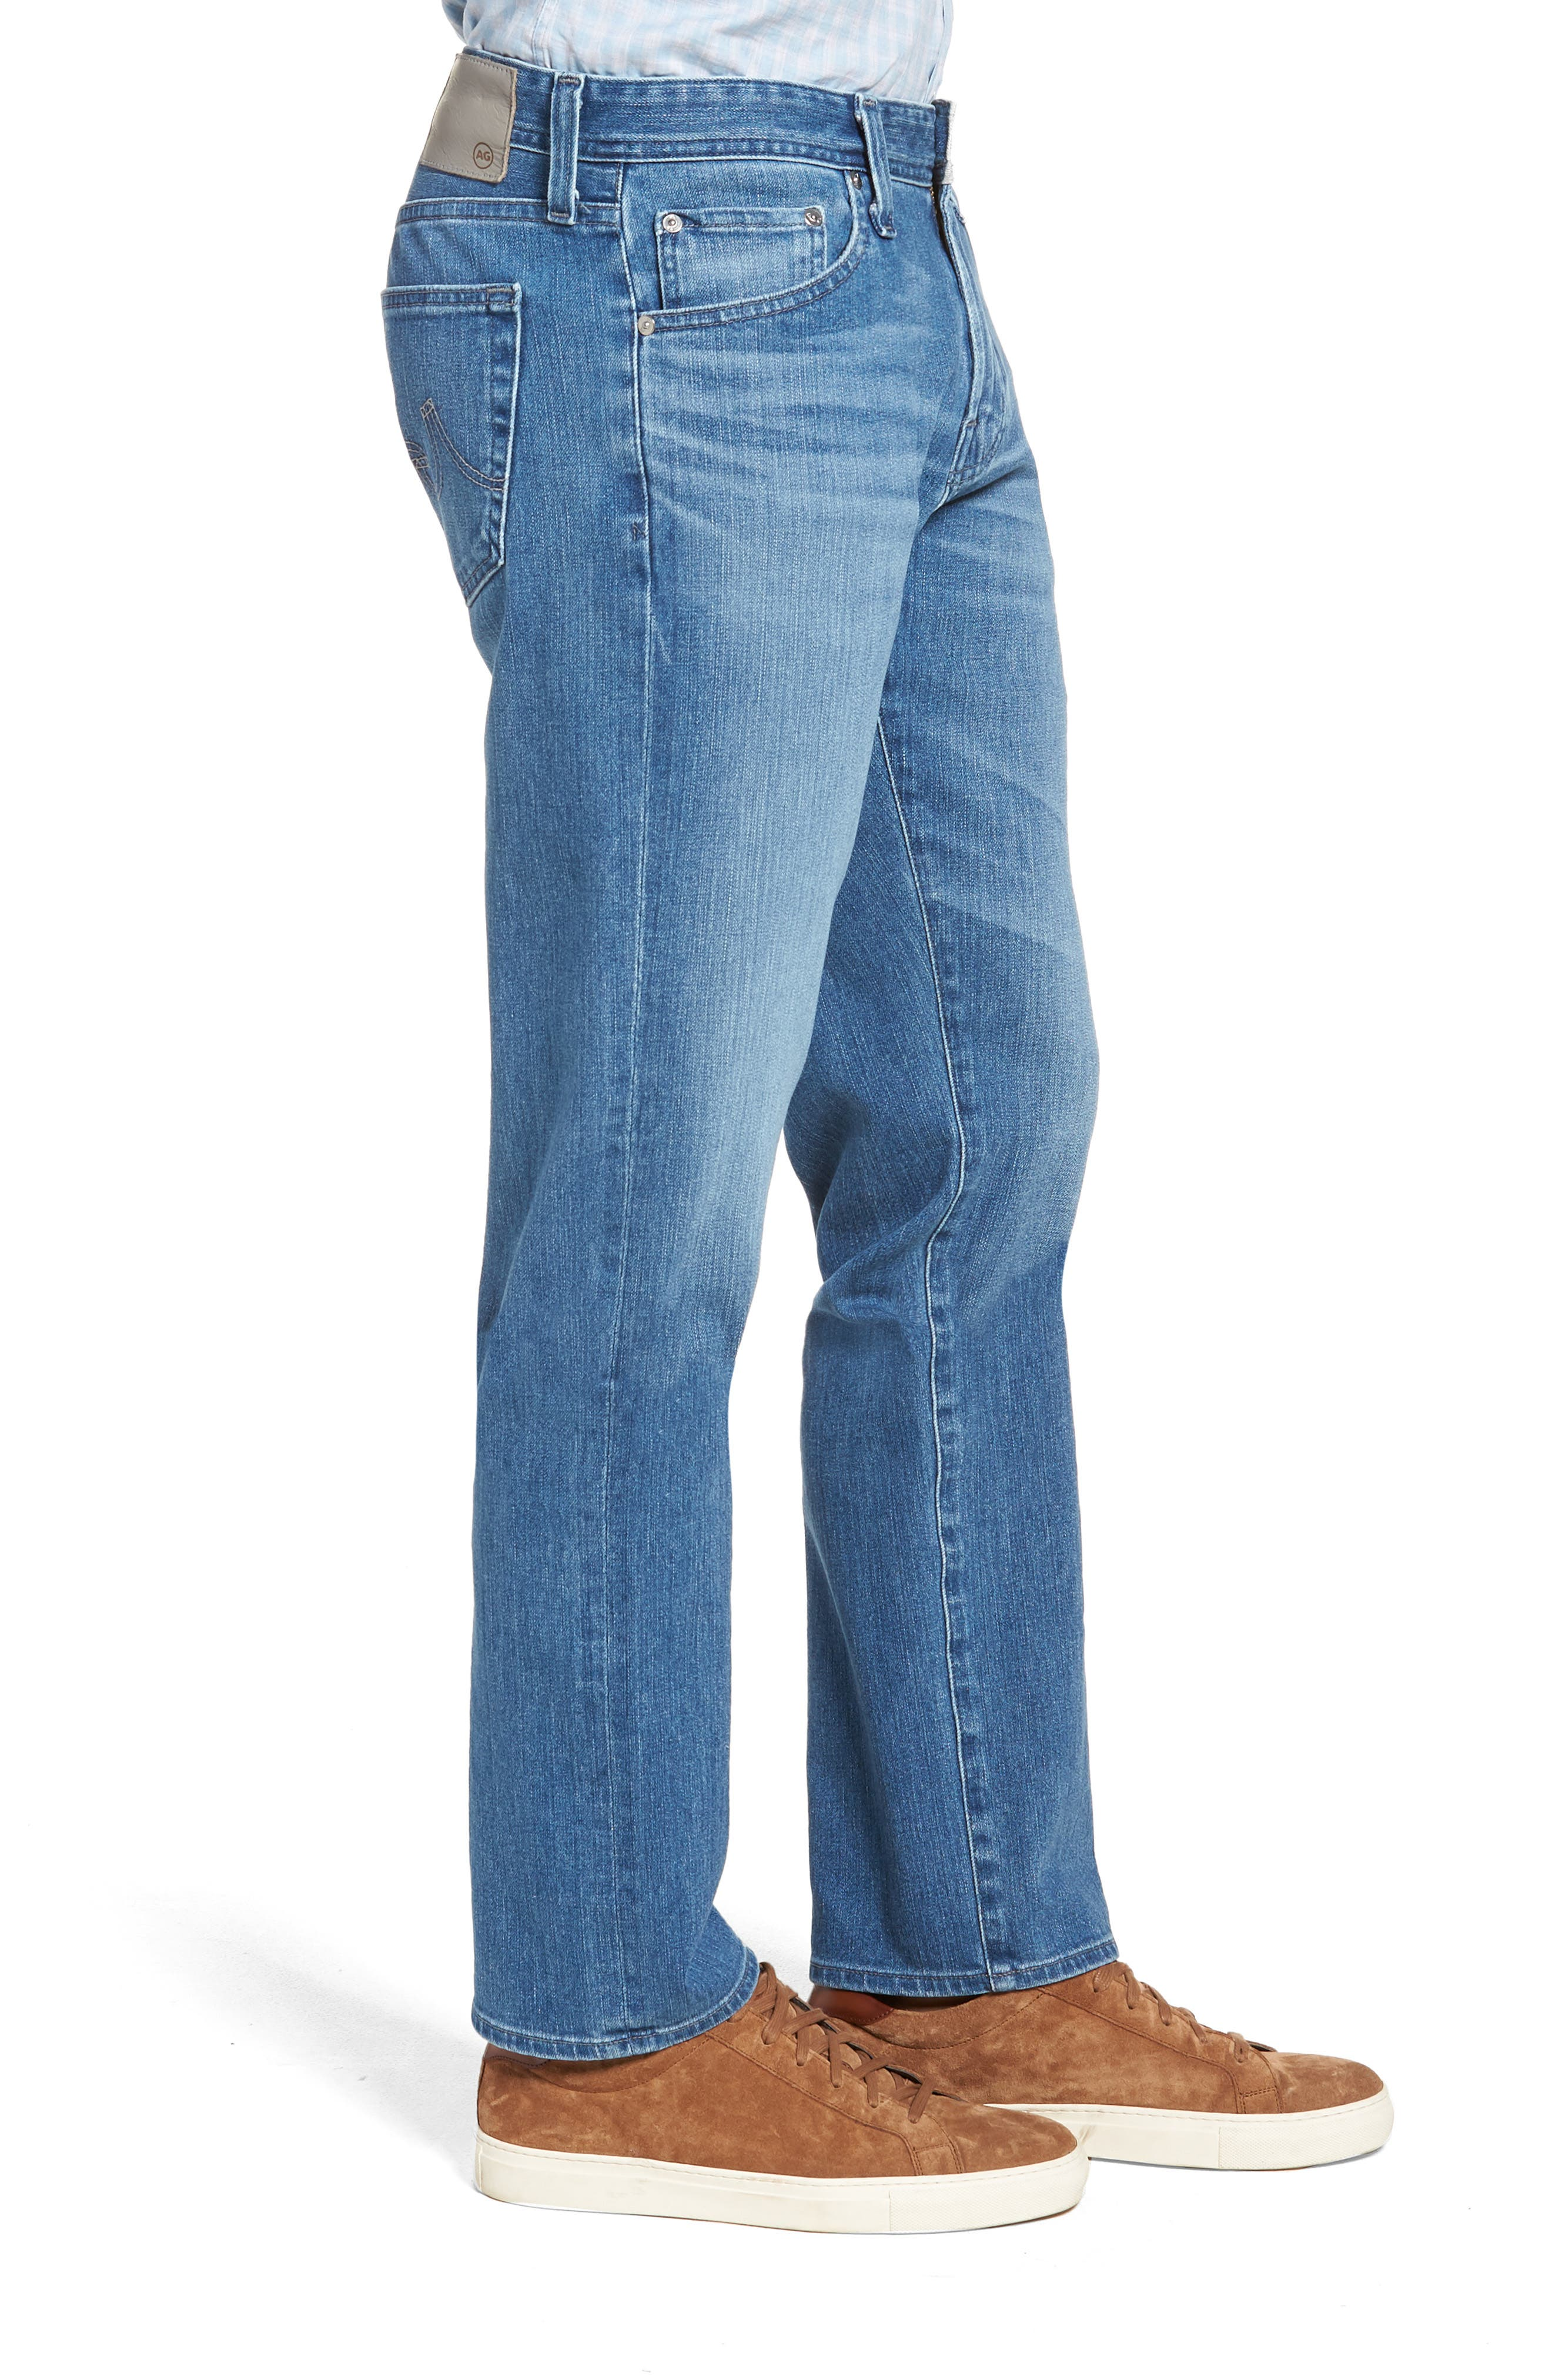 Graduate Slim Straight Leg Jeans,                             Alternate thumbnail 3, color,                             DEMOLITION